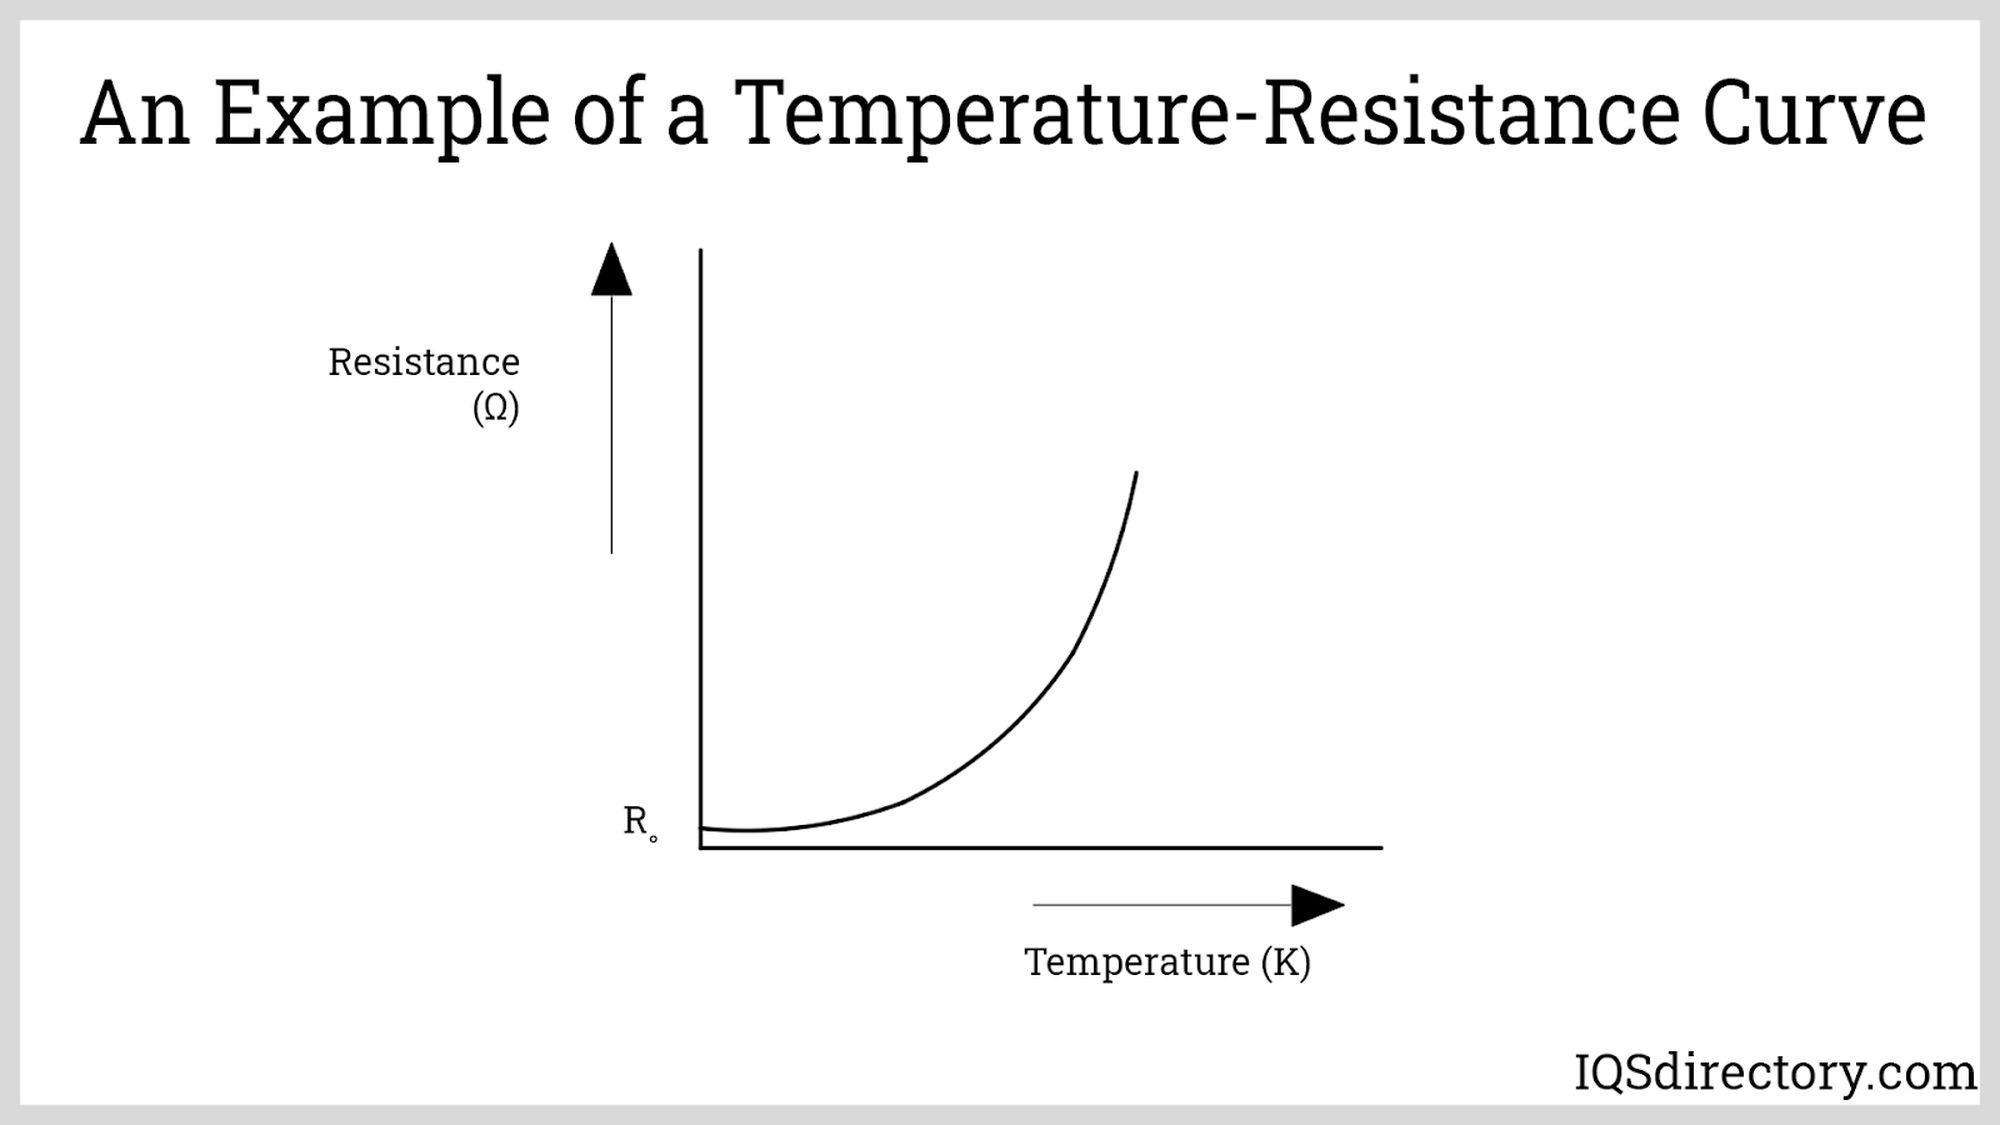 Temperature-Resistance Curve